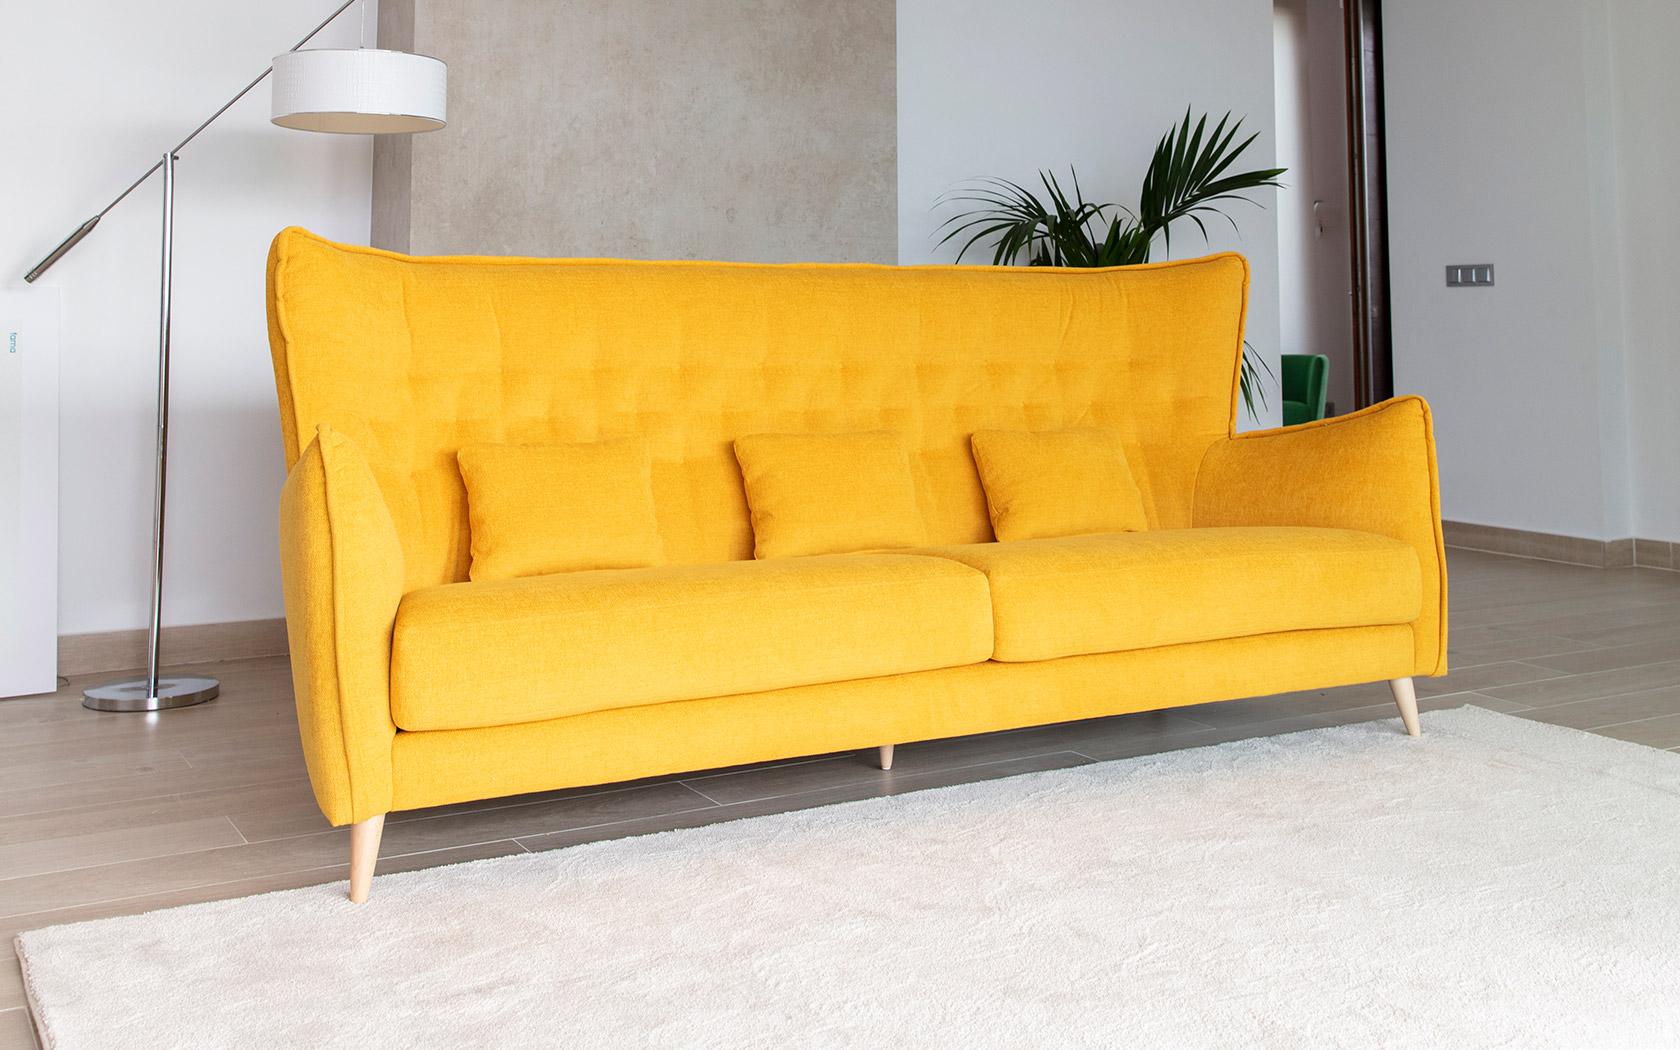 simone sofa 2021 06